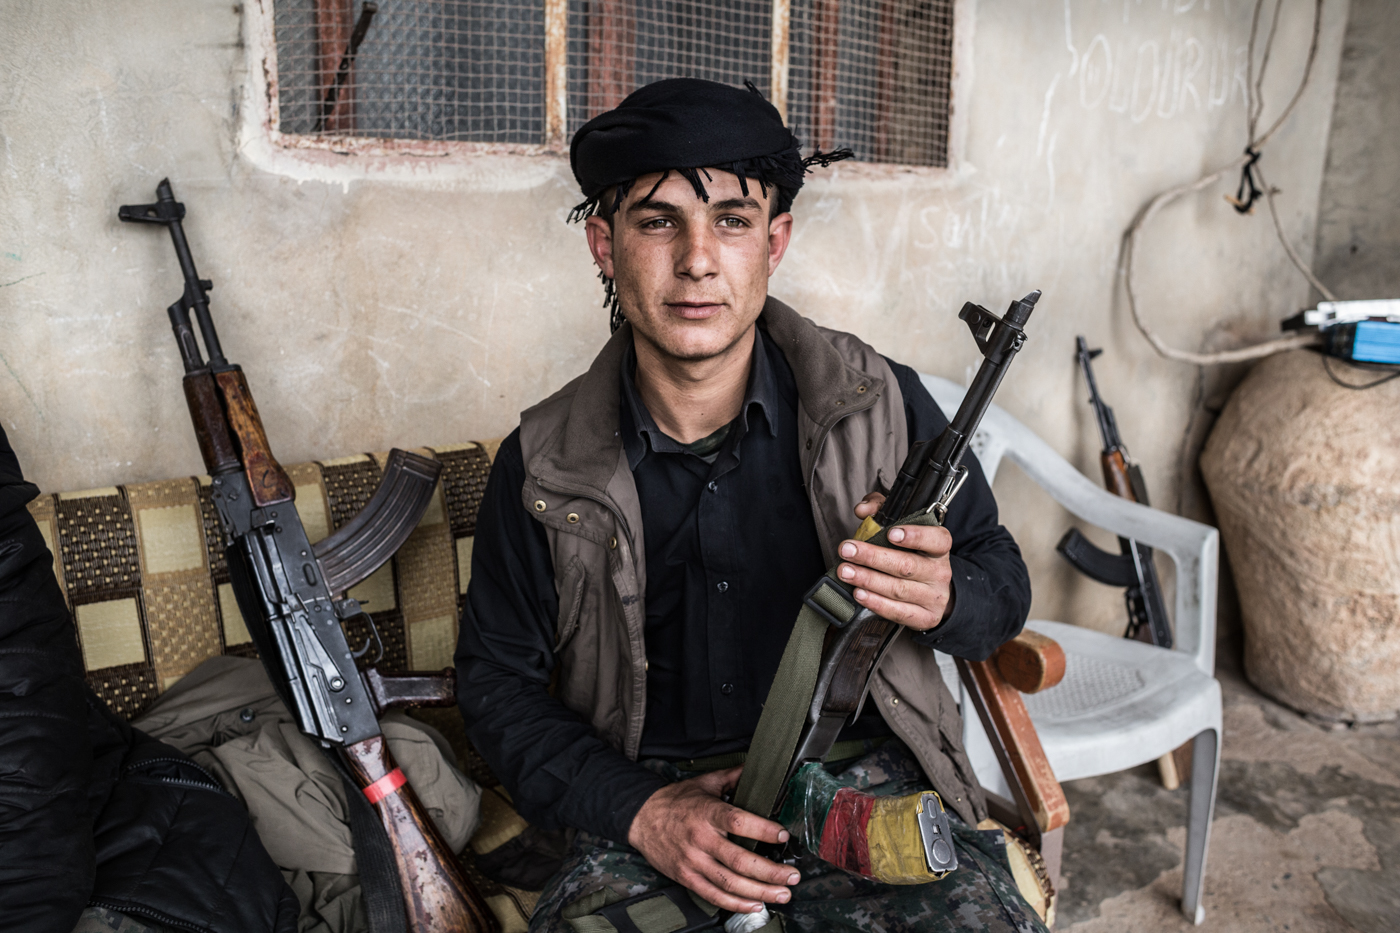 Giacomo_Sini_Italy_The_forgotten_people_of_Kurdistan_02.jpg